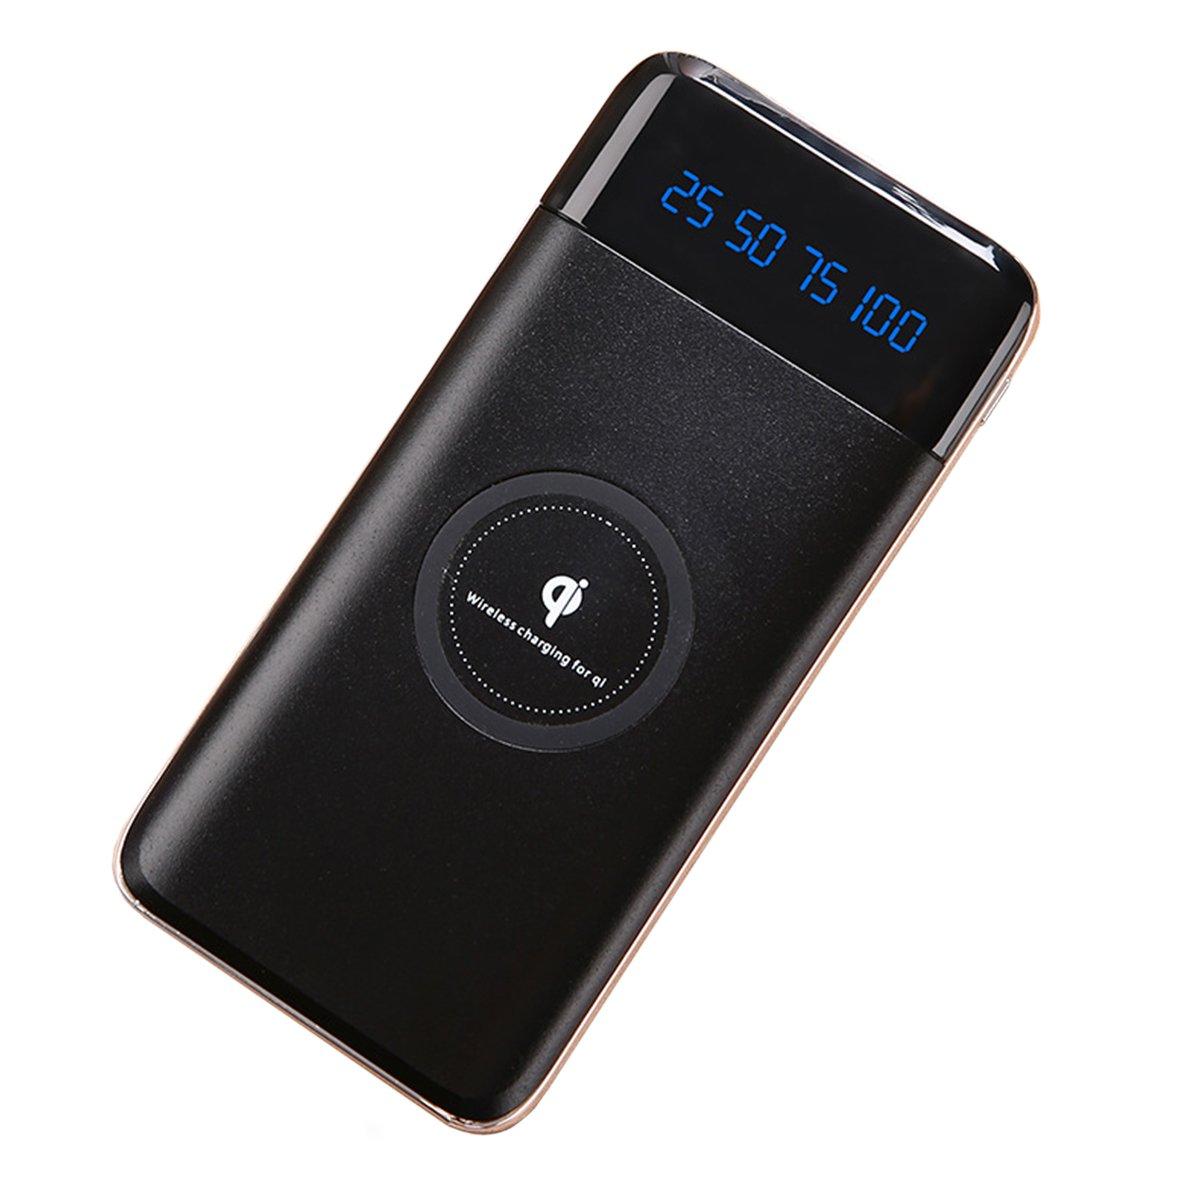 Cargador inalámbrico Power Bank, 10000 mAh Qi portátil Power Bank,2 en 1 inalámbrico Charing Battery Pack con 2 Entrada & 2 Salida para iPhone 8, iPhone 8 Plus, iPhone X, Samsung S8,